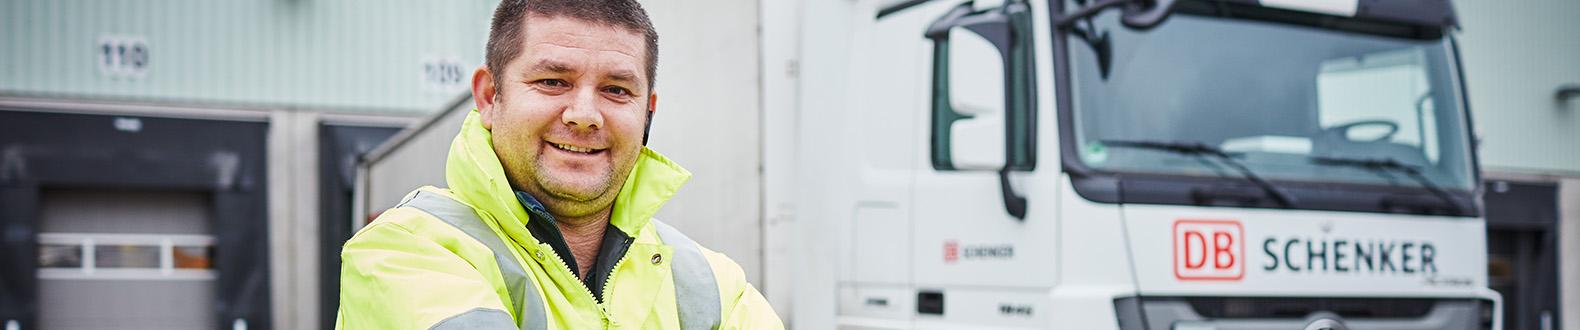 DB_Schenker_M34_Professional-Blue-Collar-Male_Truck-data